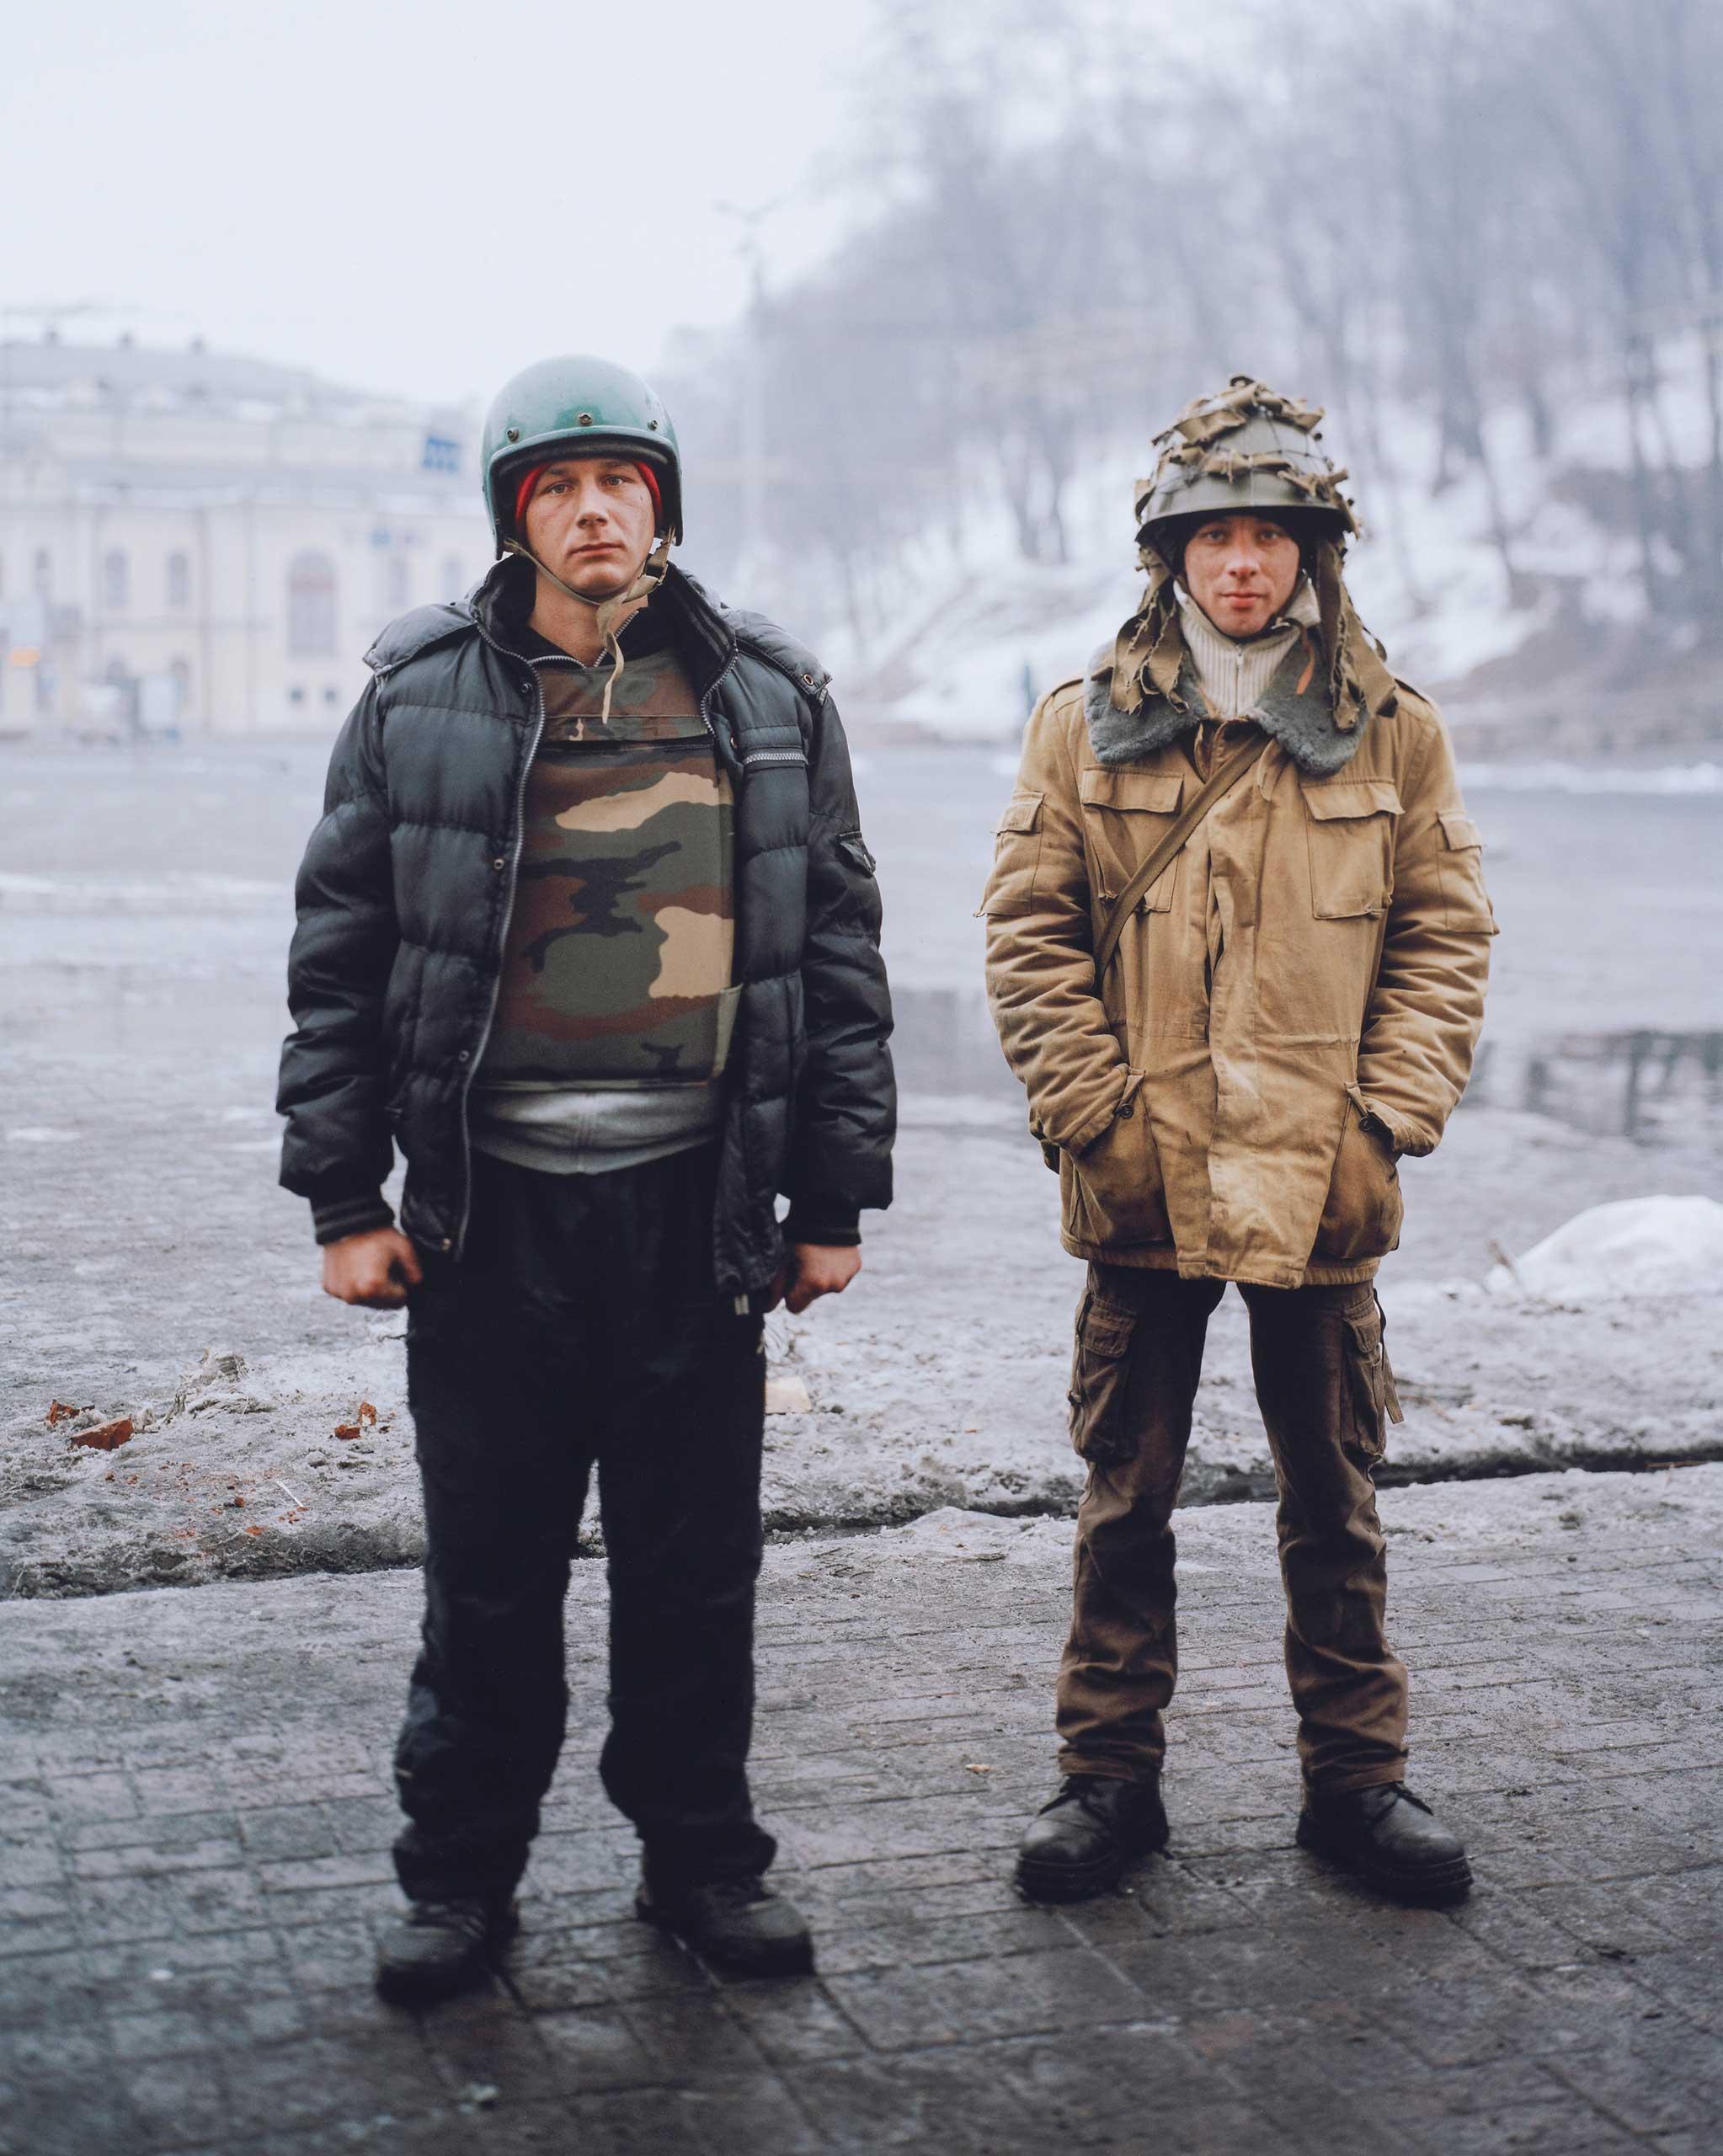 Euromaidan protestors in Kyiv, Ukraine, 2014.